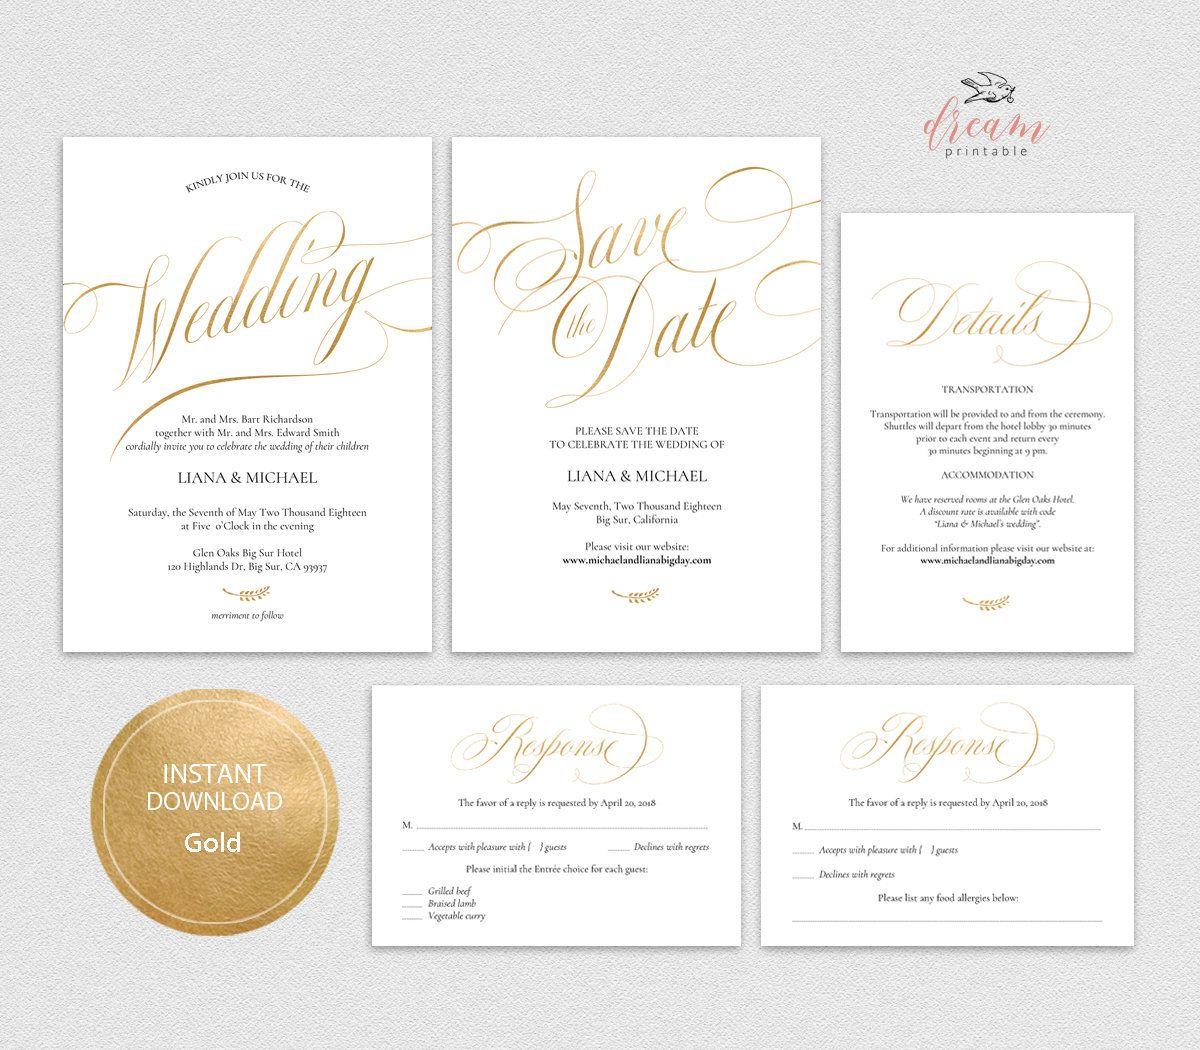 Instant Download Editable Pdf Template Set 5x7 Invitation 4x6 Etsy Wedding Invitation Templates Modern Wedding Invitation Wording Wedding Invitation Pdf